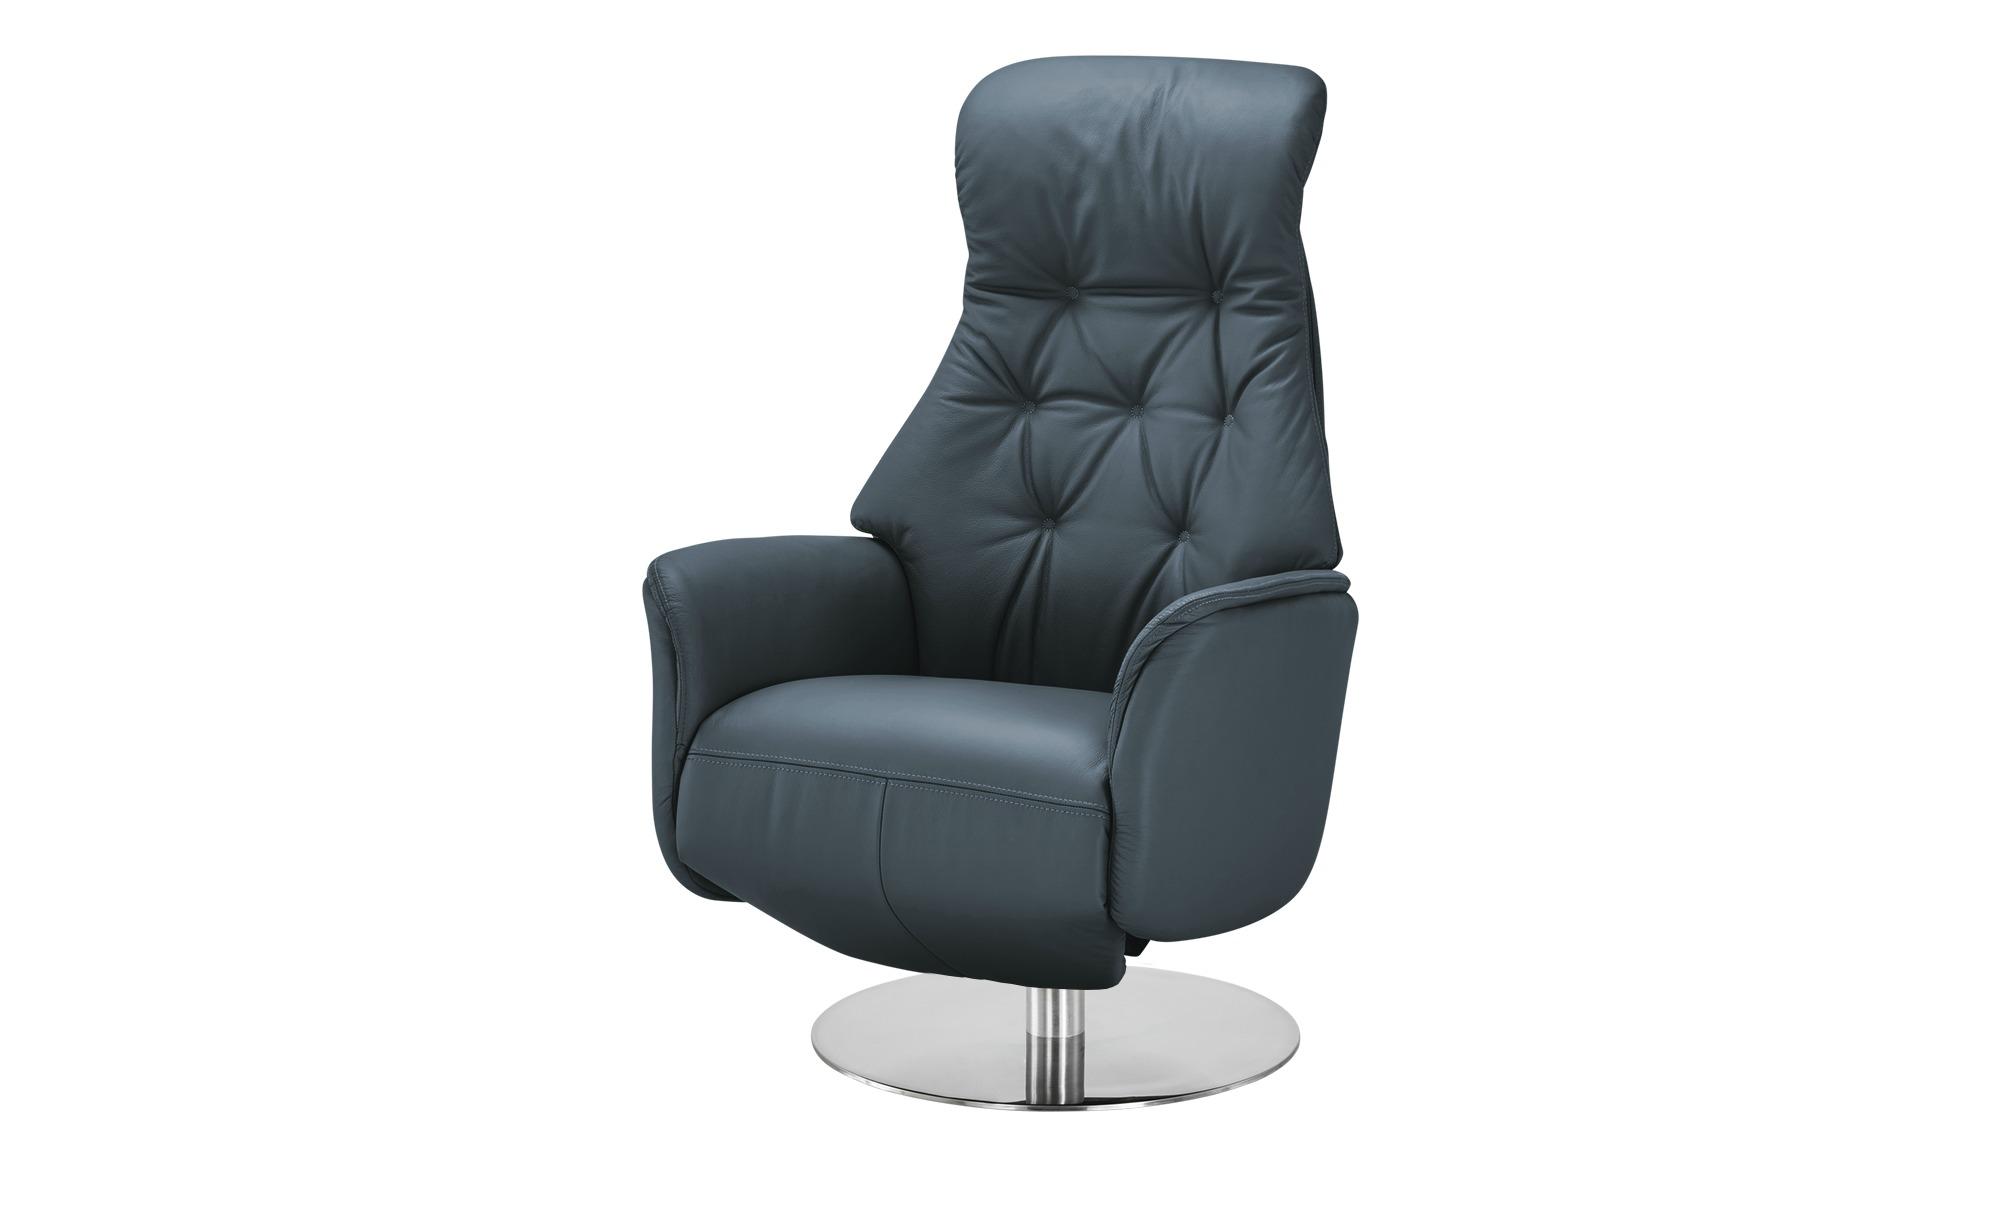 Nils Olsen Funktionssessel  Arend ¦ blau ¦ Maße (cm): B: 74 H: 114 T: 80 Polstermöbel > Sessel > Drehsessel - Höffner